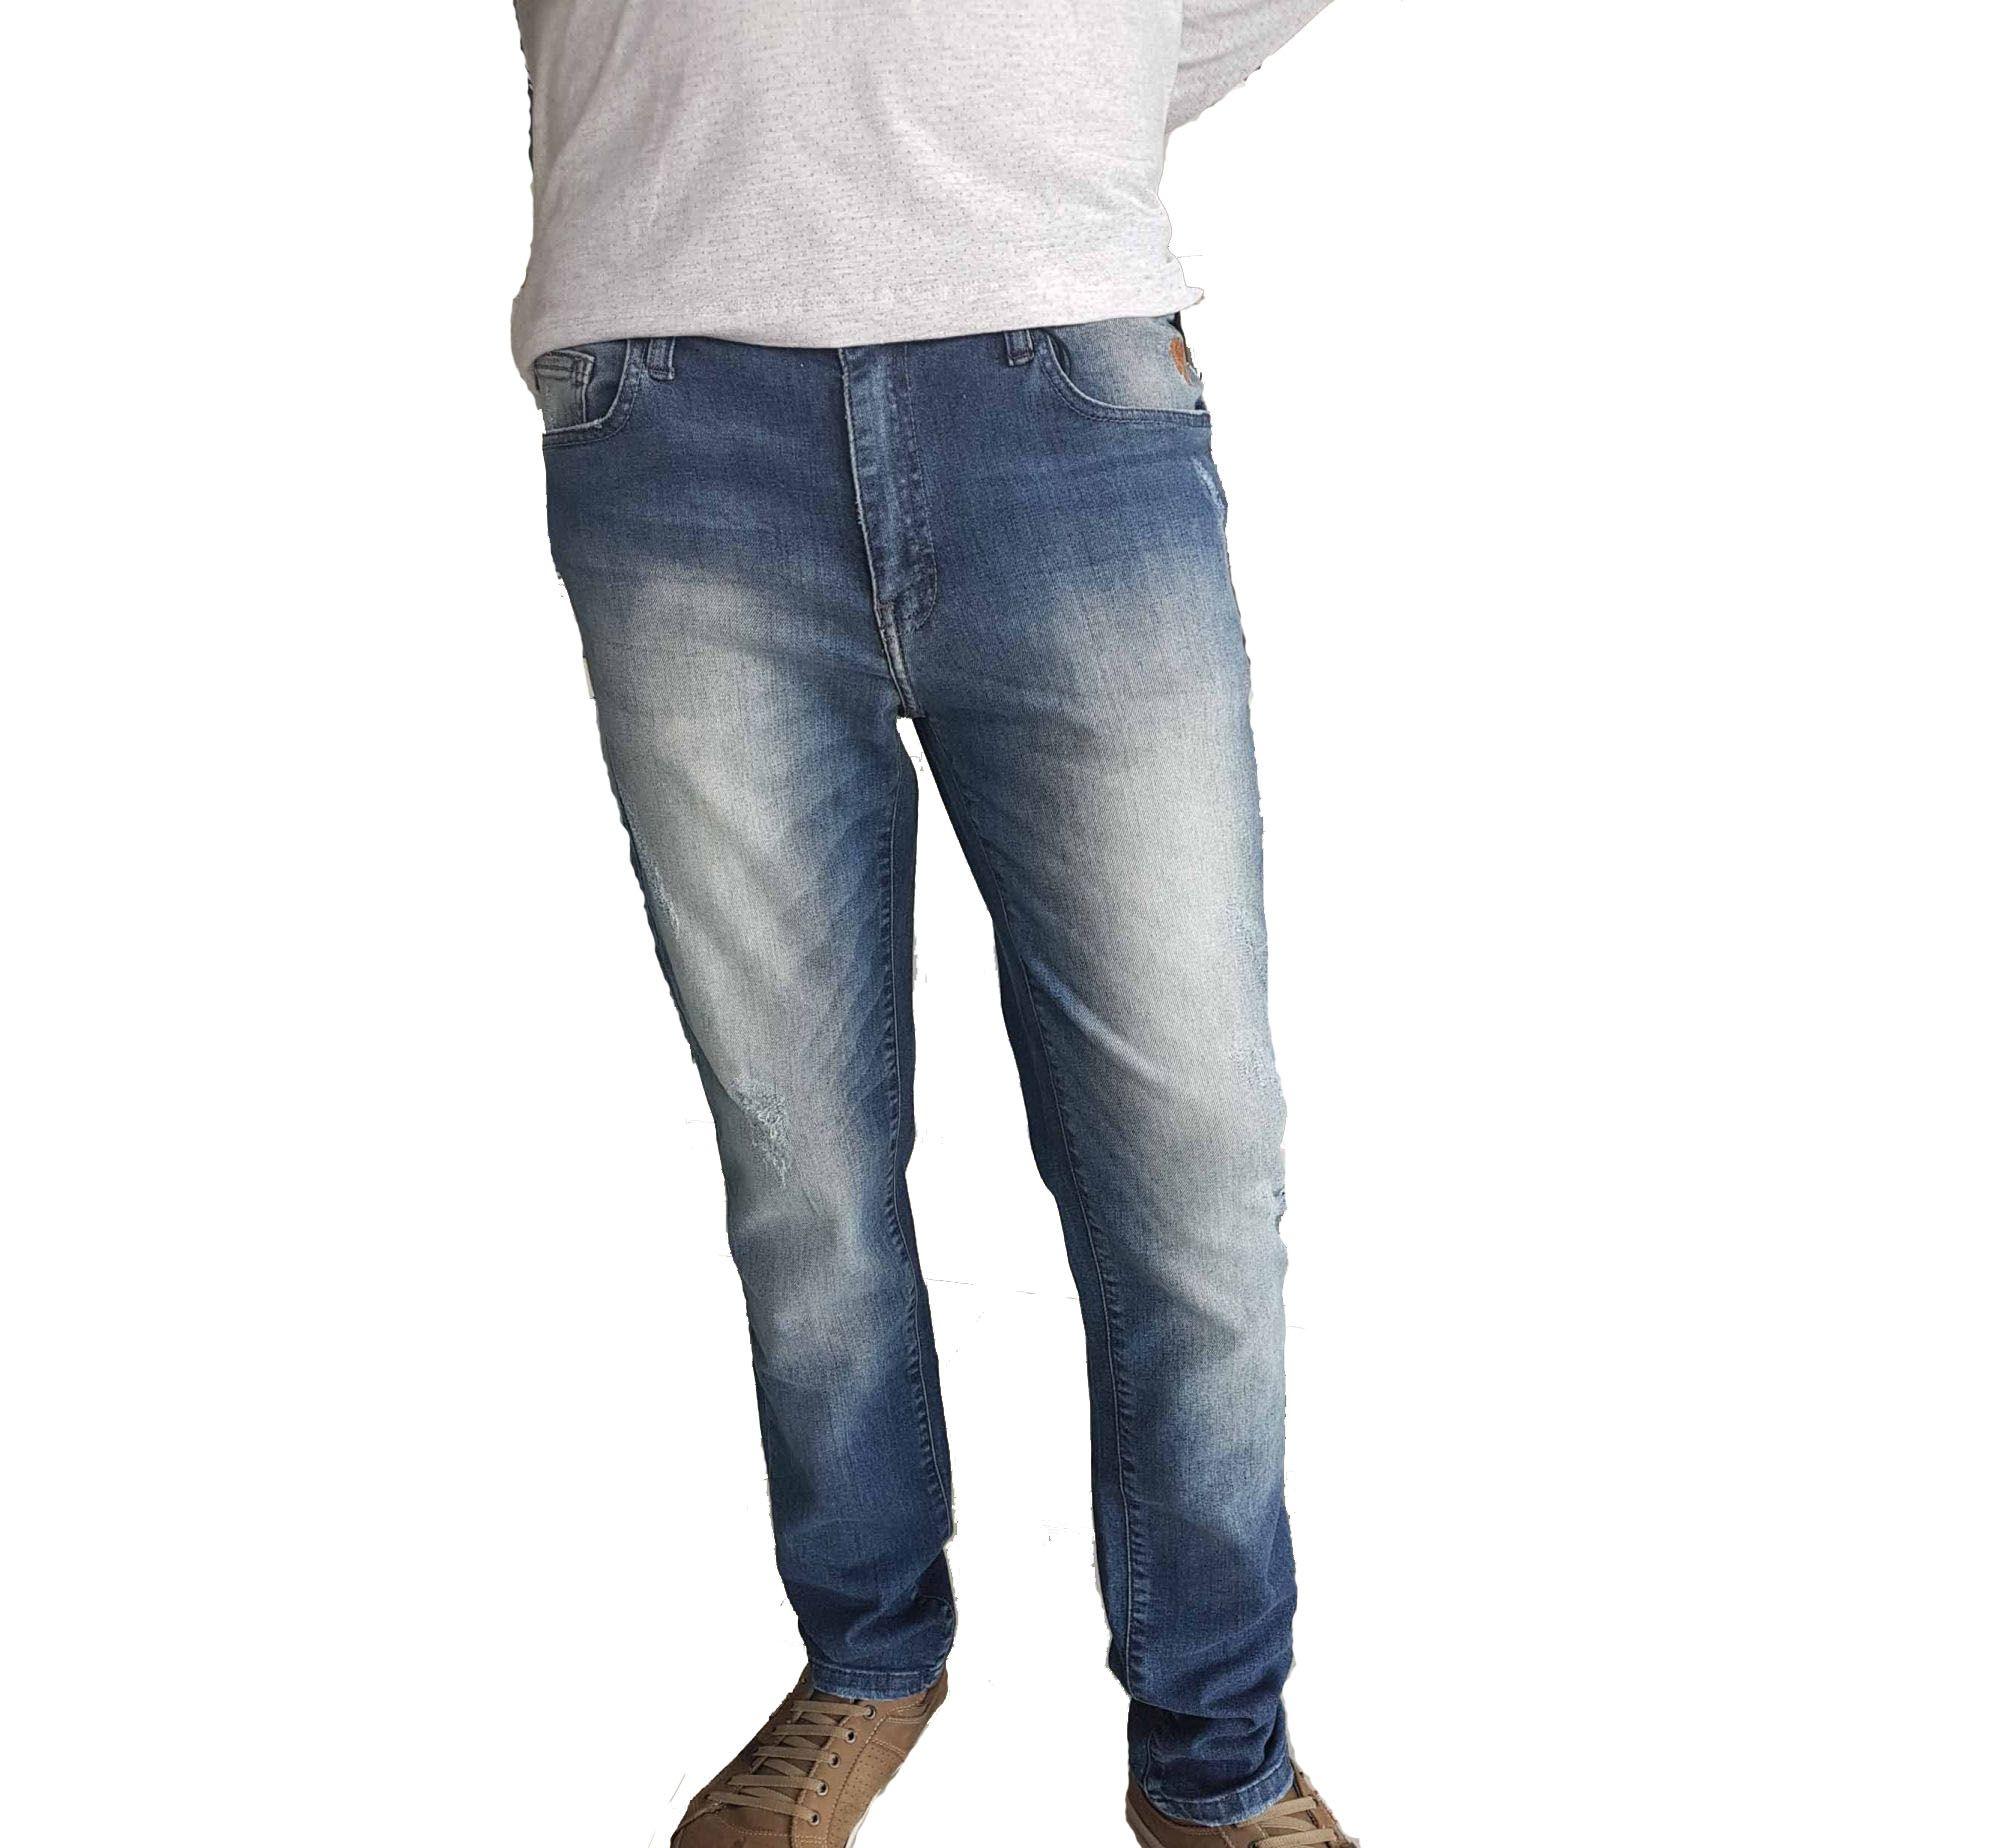 f165b48ea Calça Jeans Skinny Cavalera Rasgados Masculino Azul